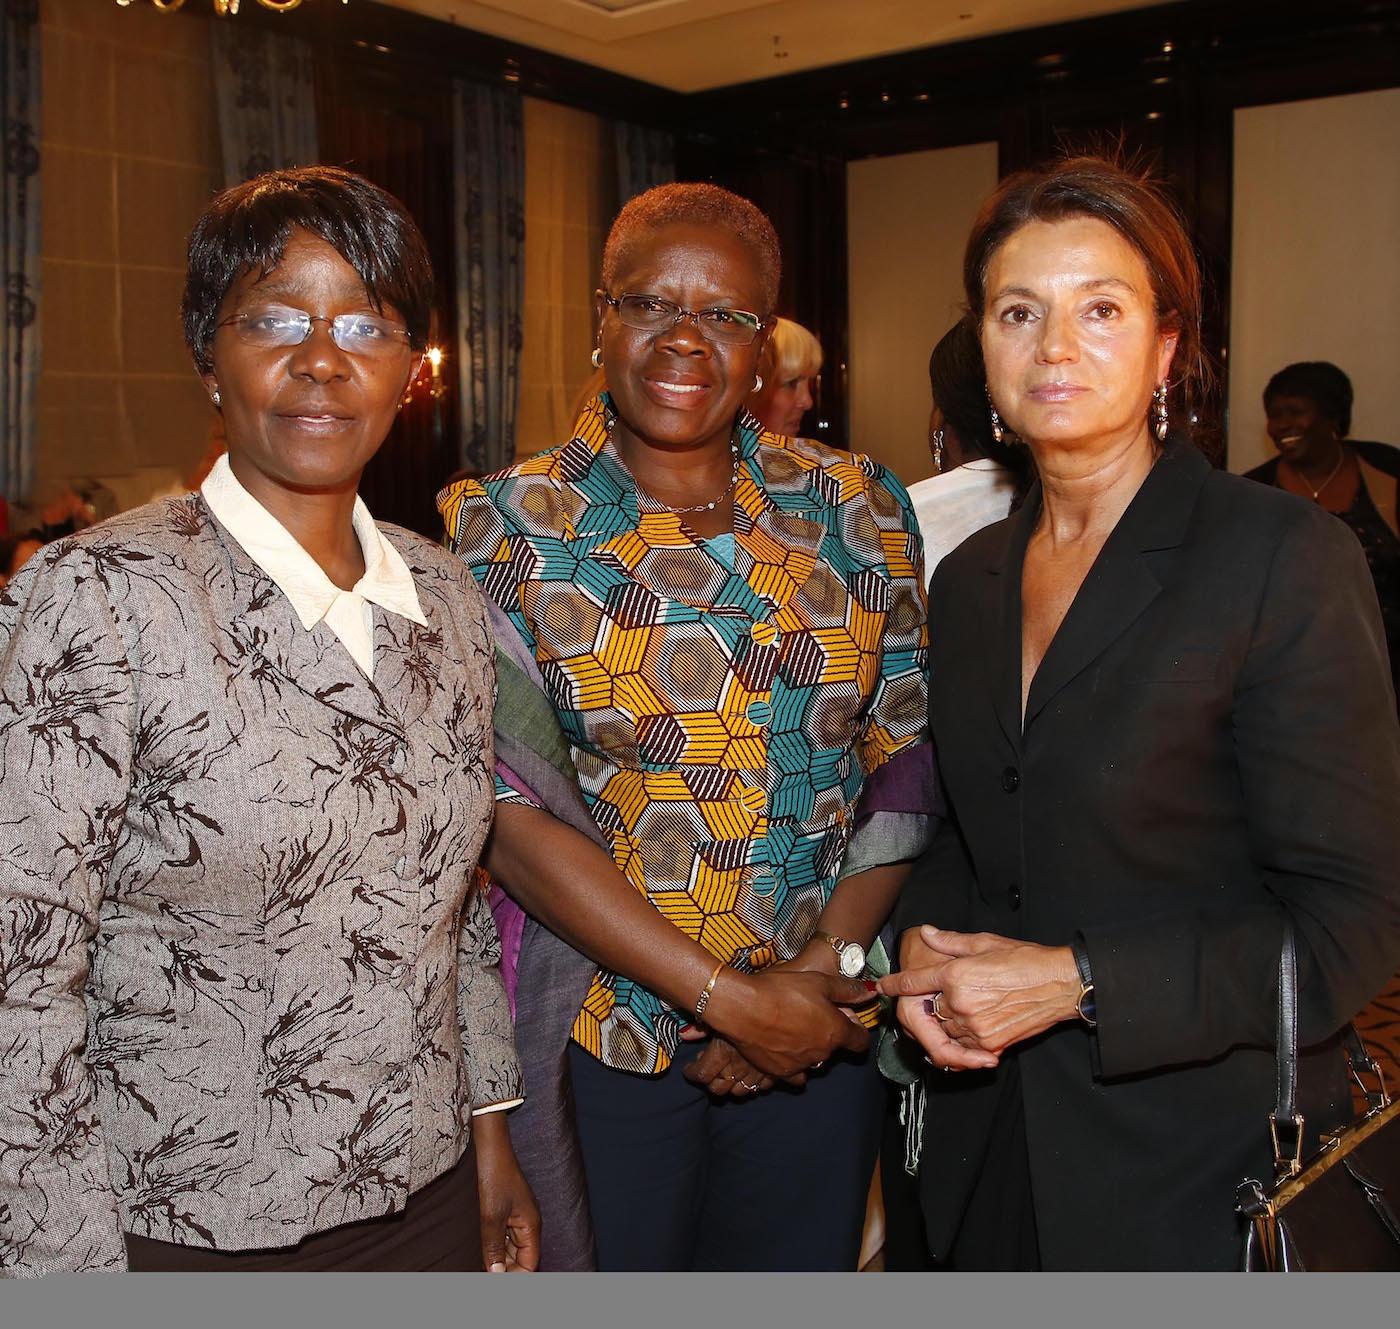 I.E. Ruth Masodzi Chikwira (Botschafterin Simbabwe), I.E. Akua Sena Dansua (Botschafterin Ghana), Prof. Dr. Margarita Mathiopoulos bei der Ambassadors Club Veranstaltung -Women for Peace- im MARITIM Hotel Berlin.